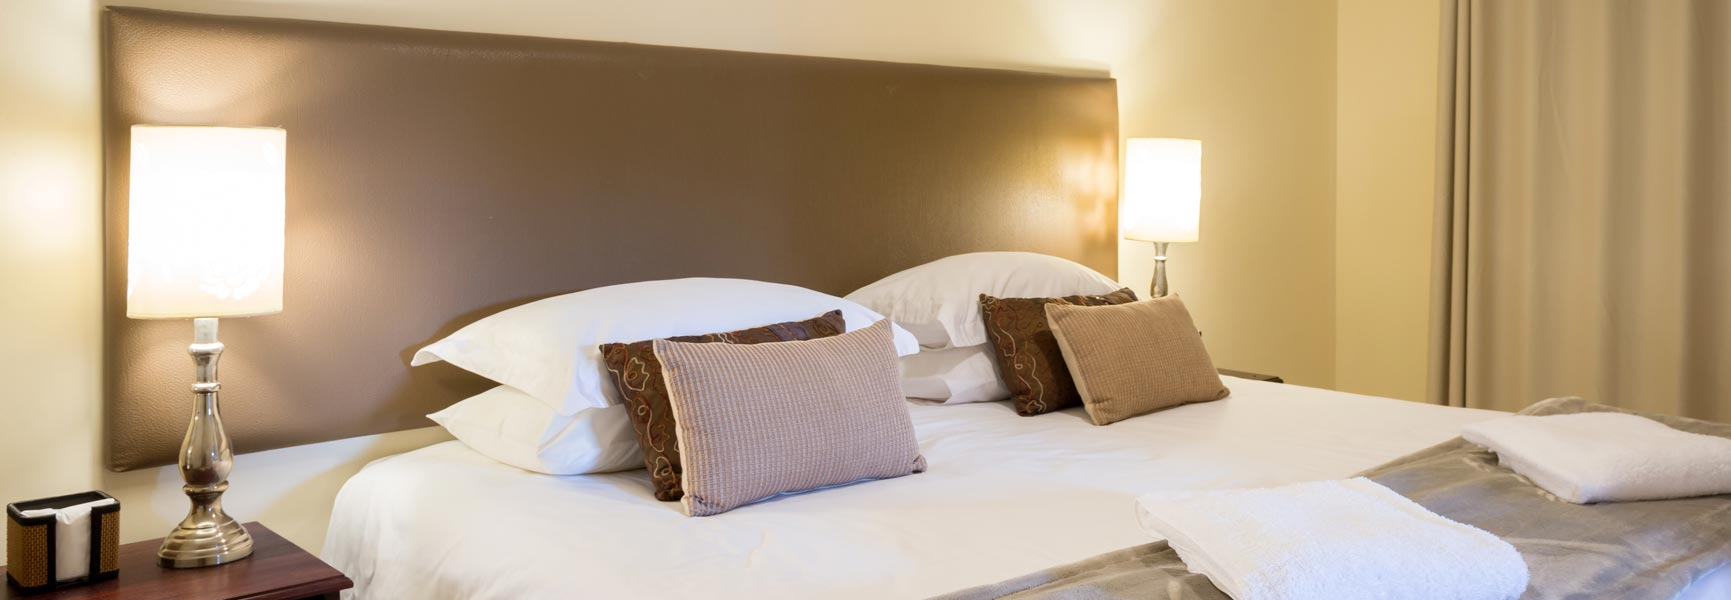 bedroom-slider1